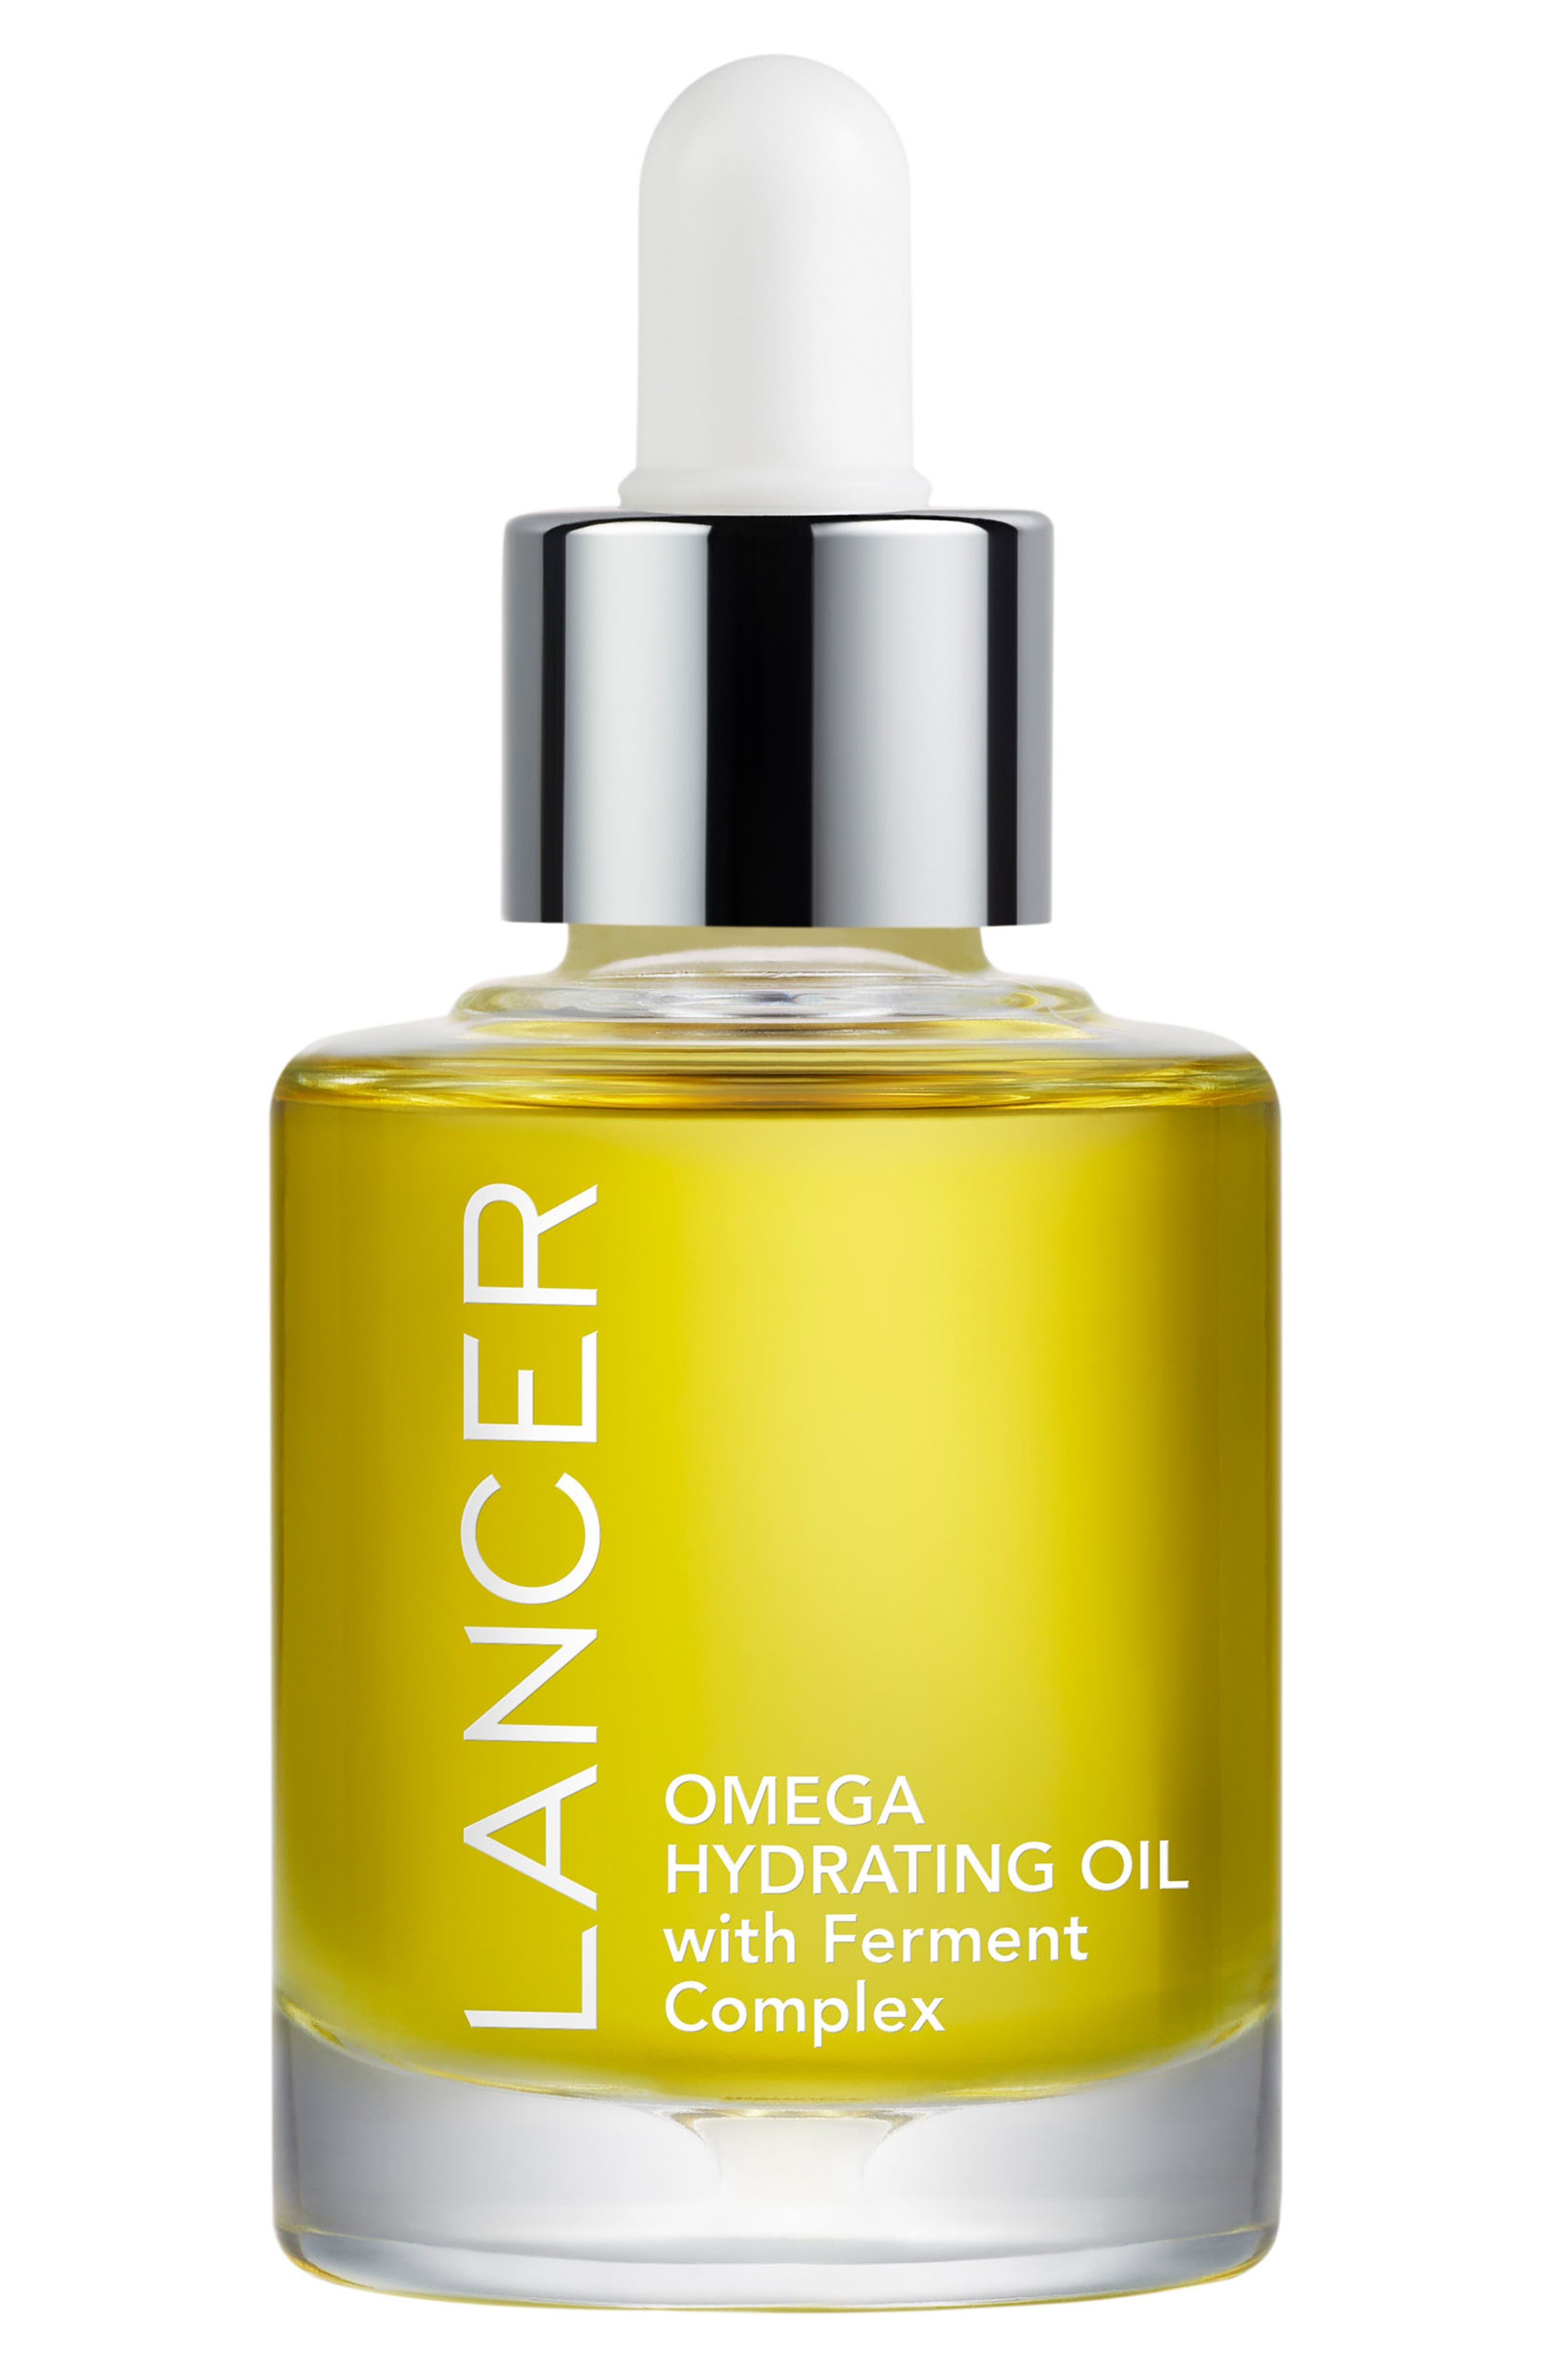 Omega Hydrating Oil | Nordstrom